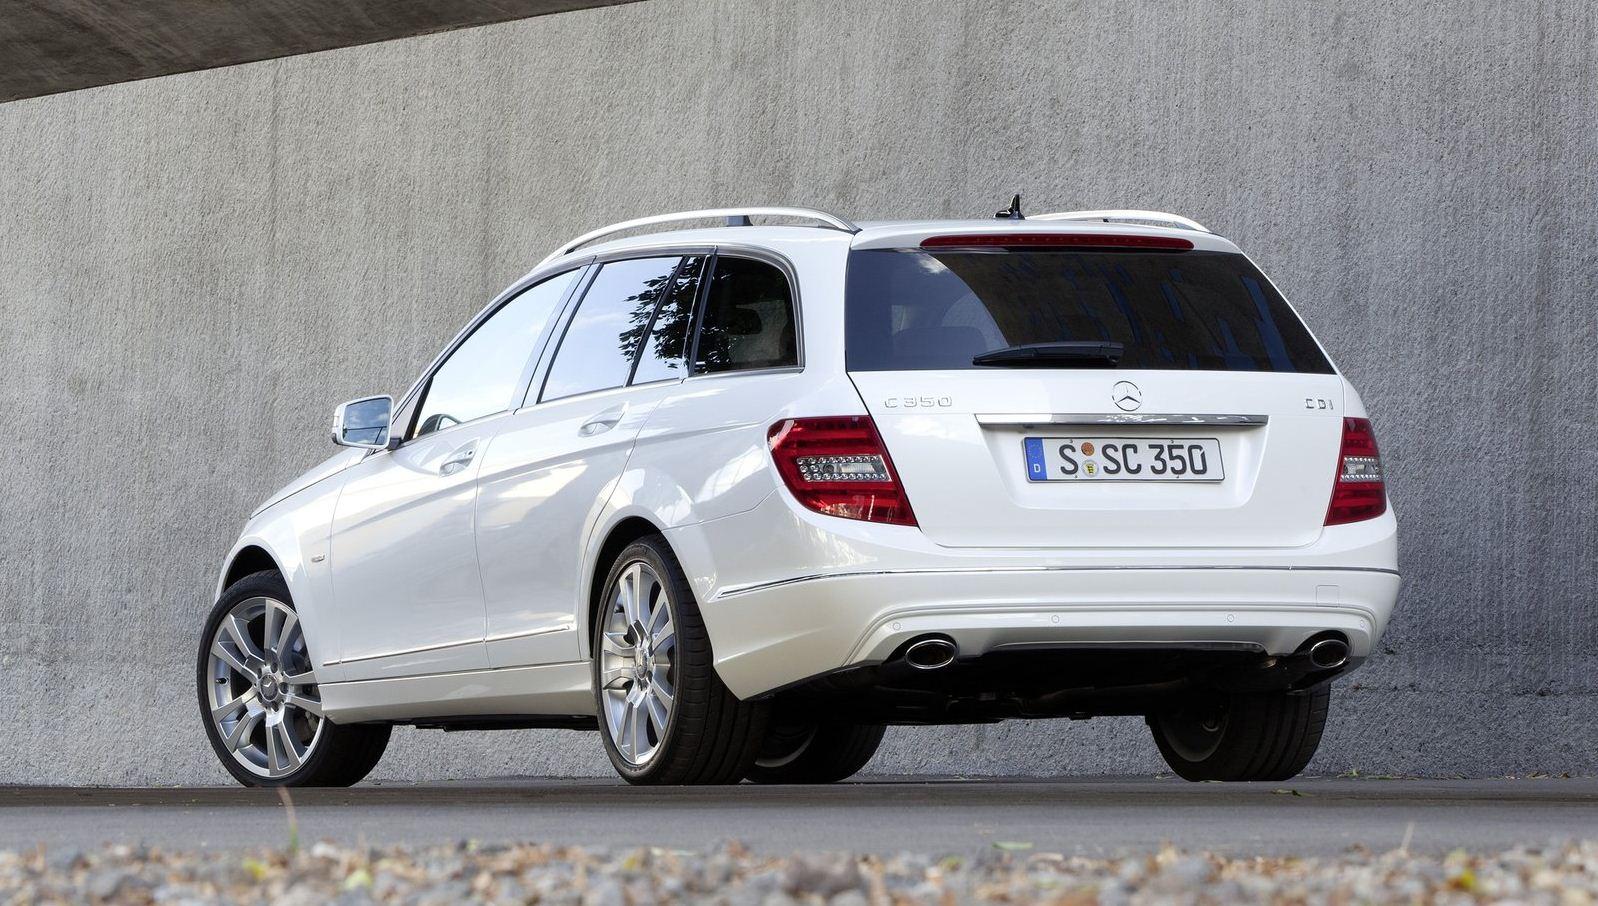 http://1.bp.blogspot.com/_pXnW36GSjVA/TR8EhbBGxjI/AAAAAAAAEPo/CnP-fzArILY/s1600/Mercedes%2BC-Class%2BEstate%2B350.JPG